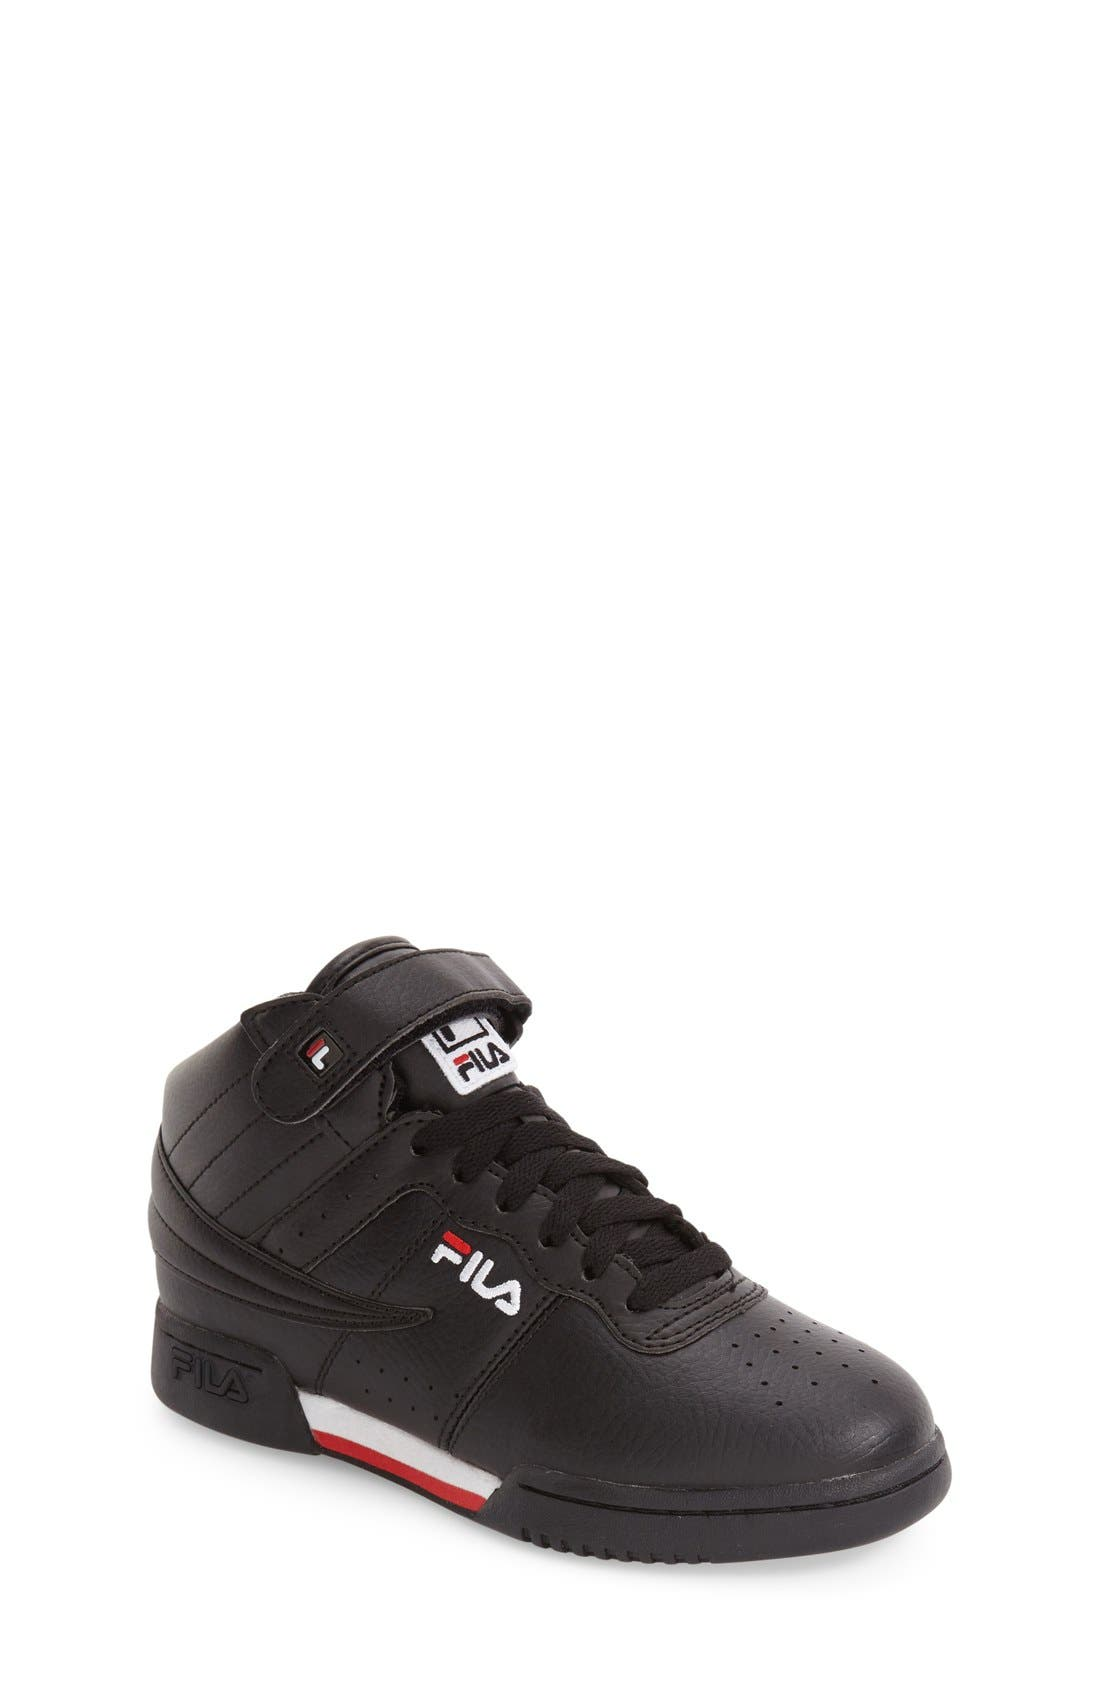 F-13 High Top Sneaker,                         Main,                         color, 001